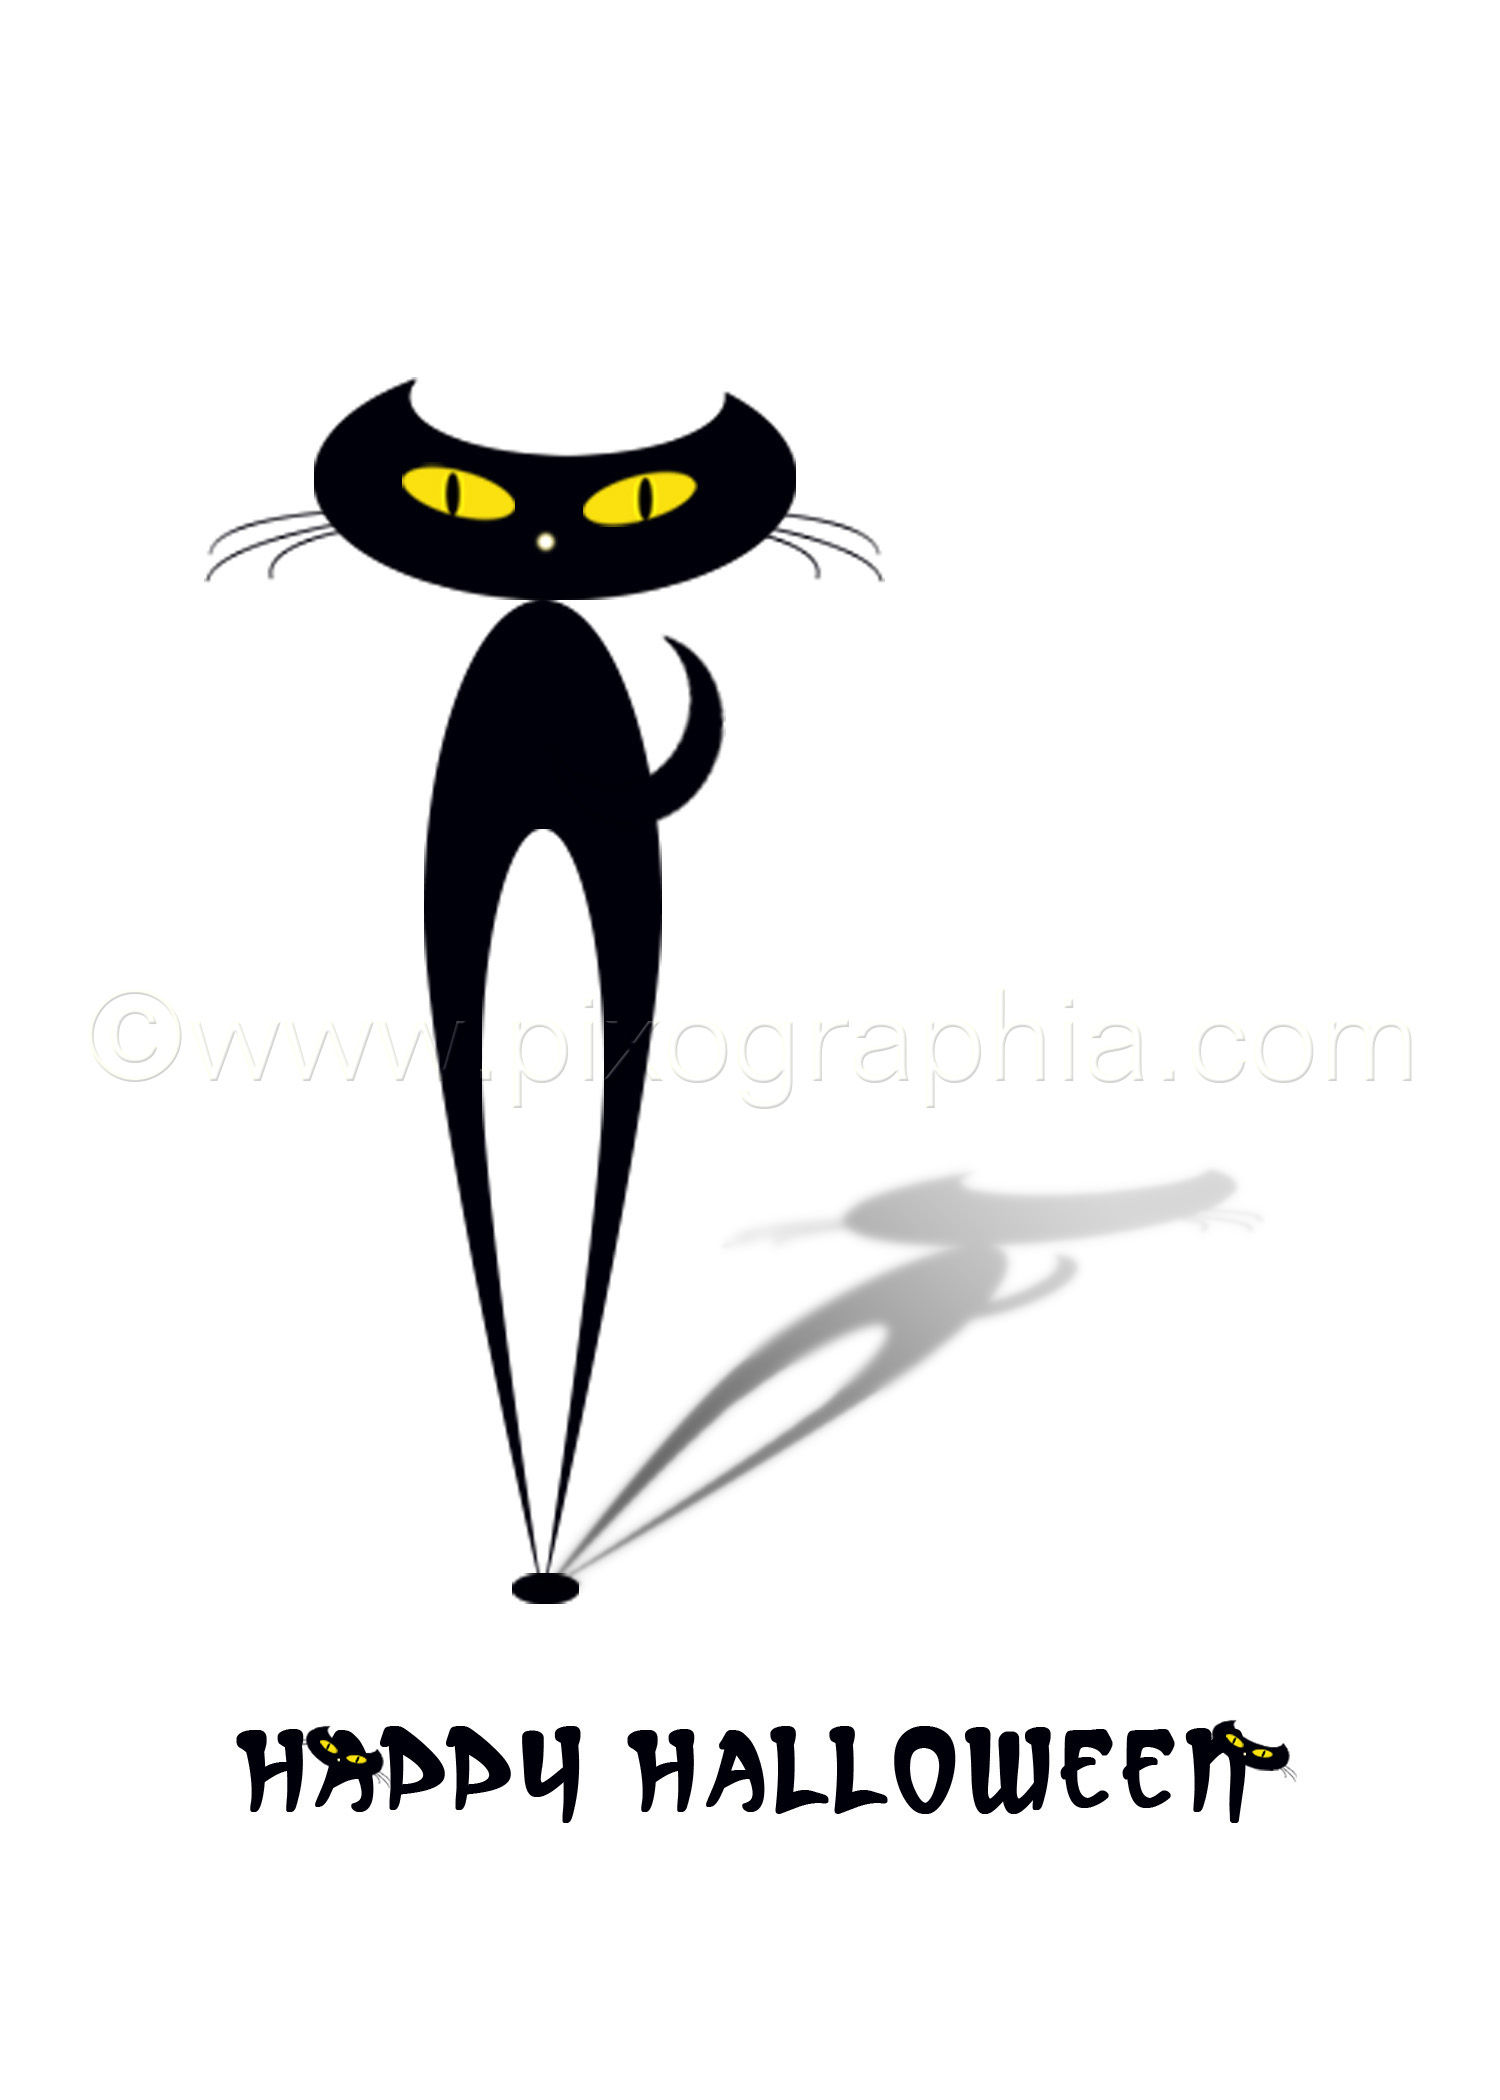 Black_cat_Halloween.jpg